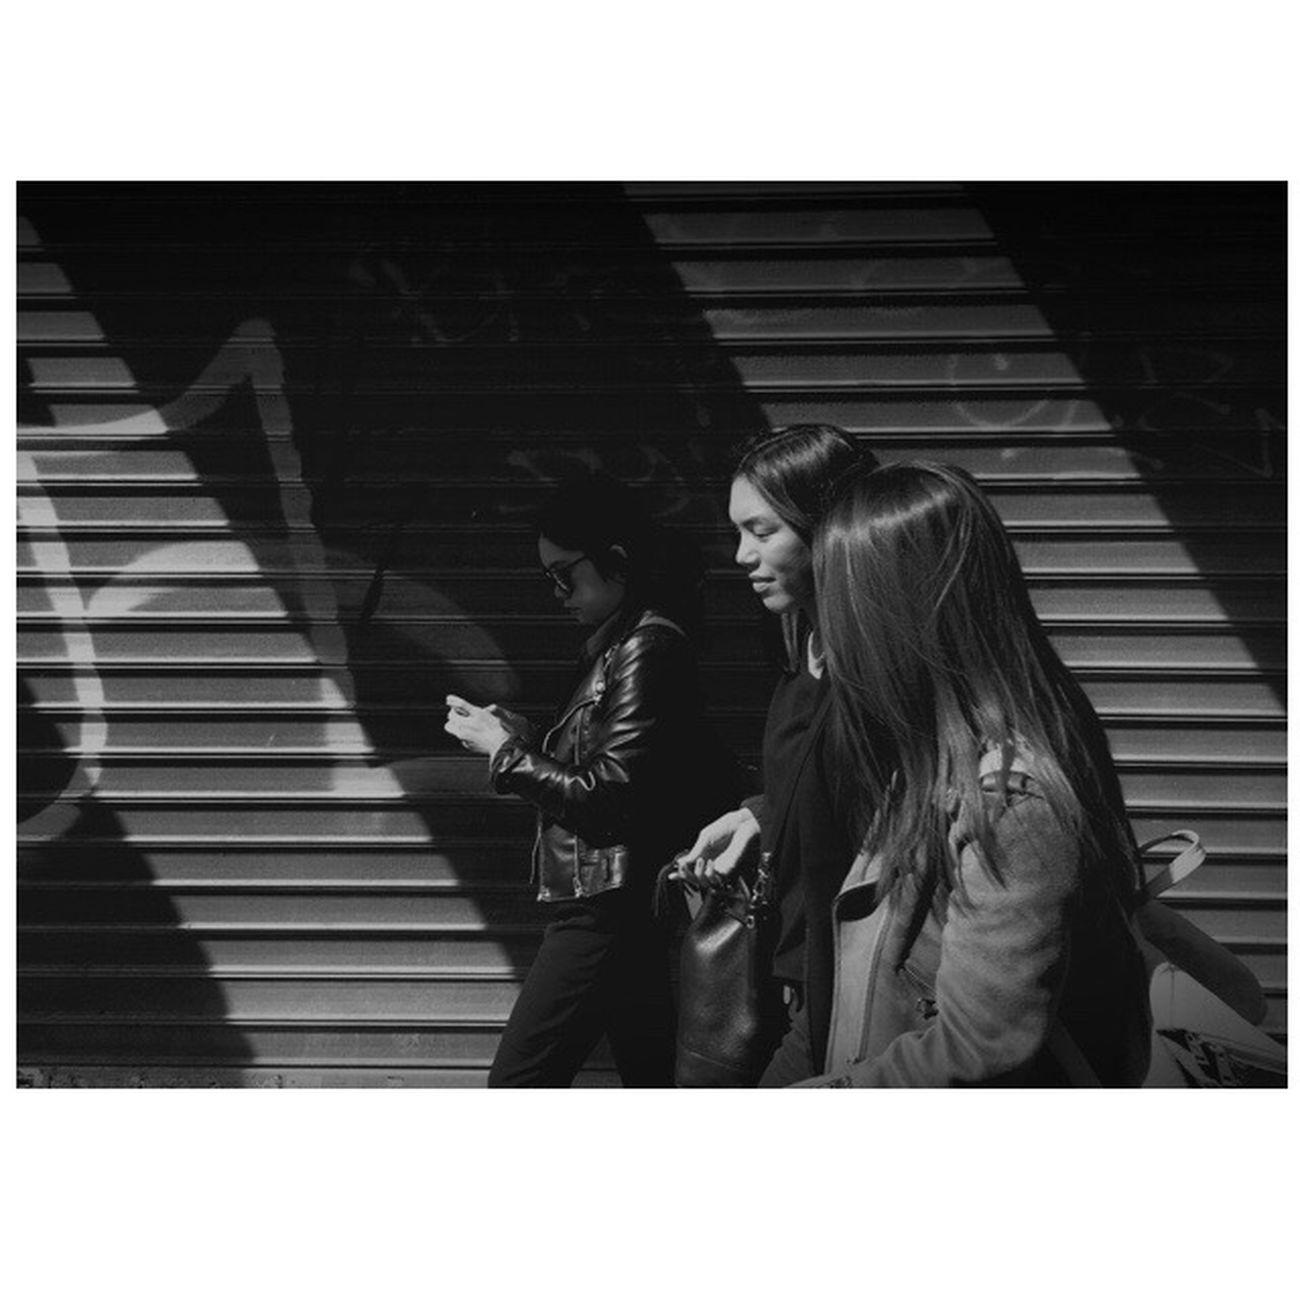 Mobilecameraclub Mobile Camera Club Black & White Streetphotography IPhoneography Paris Blackandwhite Taking Photos City Life Photo Photo Of The Day B&w Blackandwhite Photography AMPt - Shoot Or Die Smartphonephotography Parisian Lifestyles City Street EyeEm Best Shots Street_photo_club Everybody Street Everybodystreet The SmART Gallery Parisian Connexion Wearethestreet